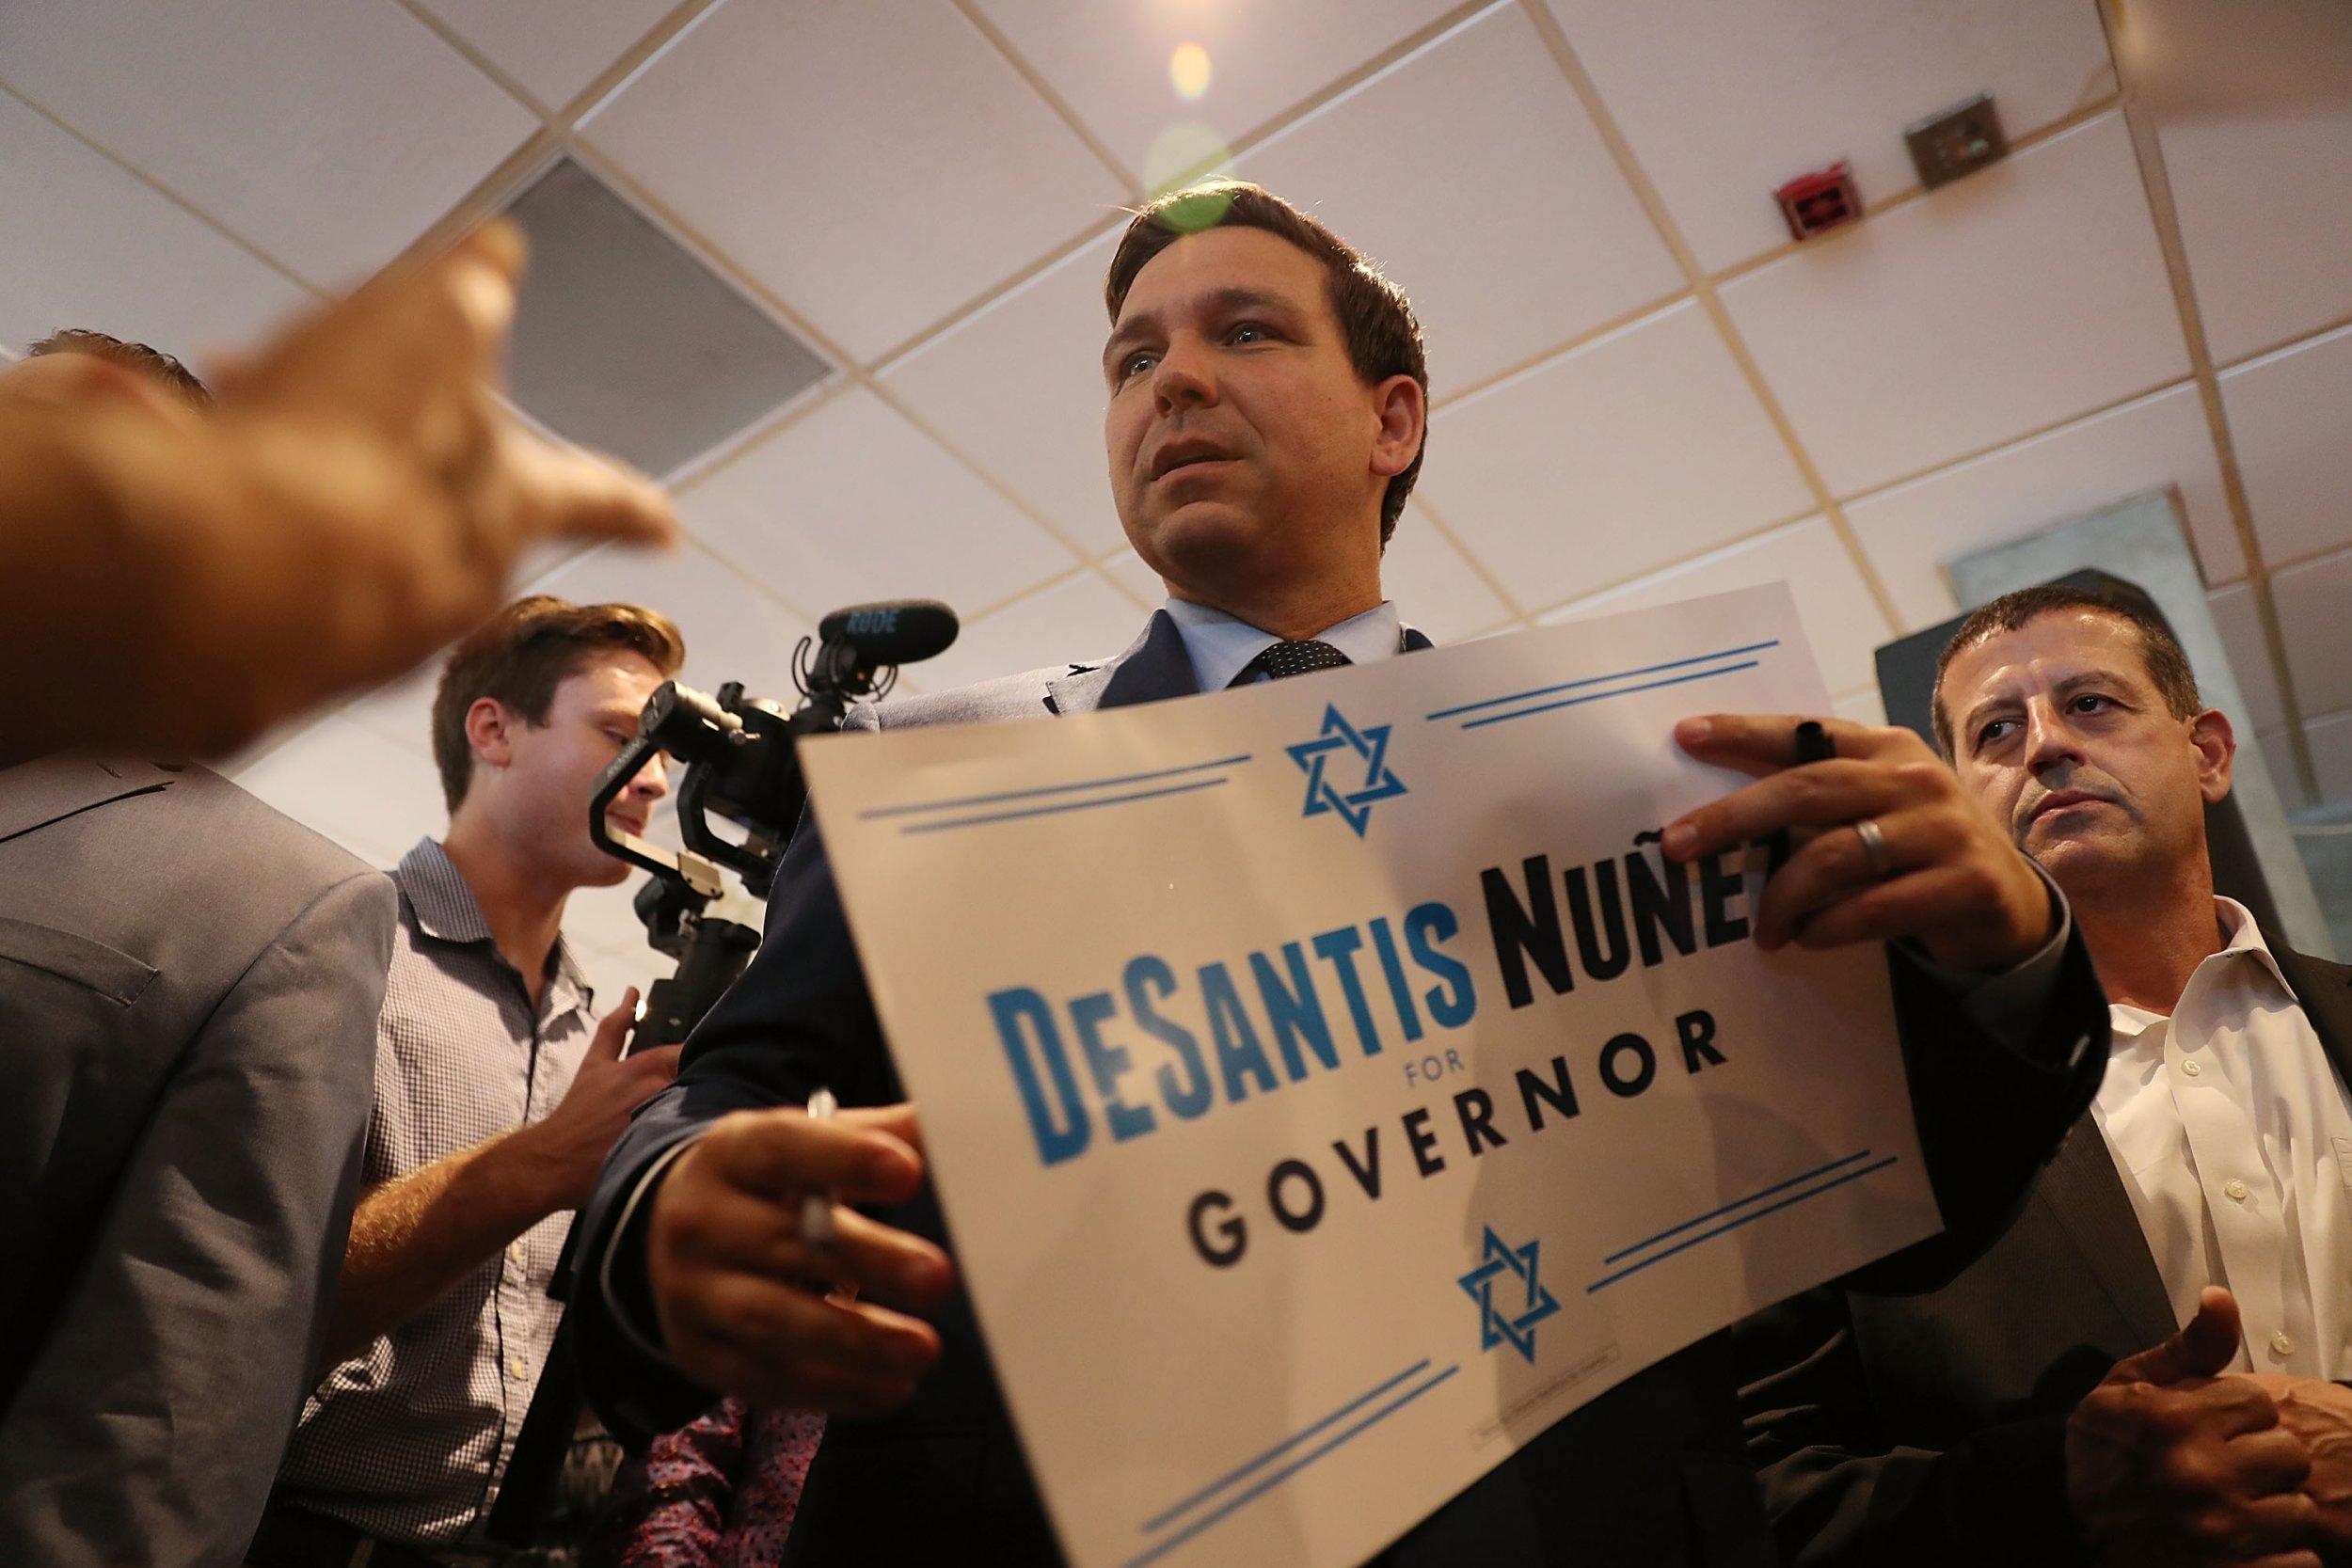 Ron DeSantis Campaign hillary clinton, bomb, threat